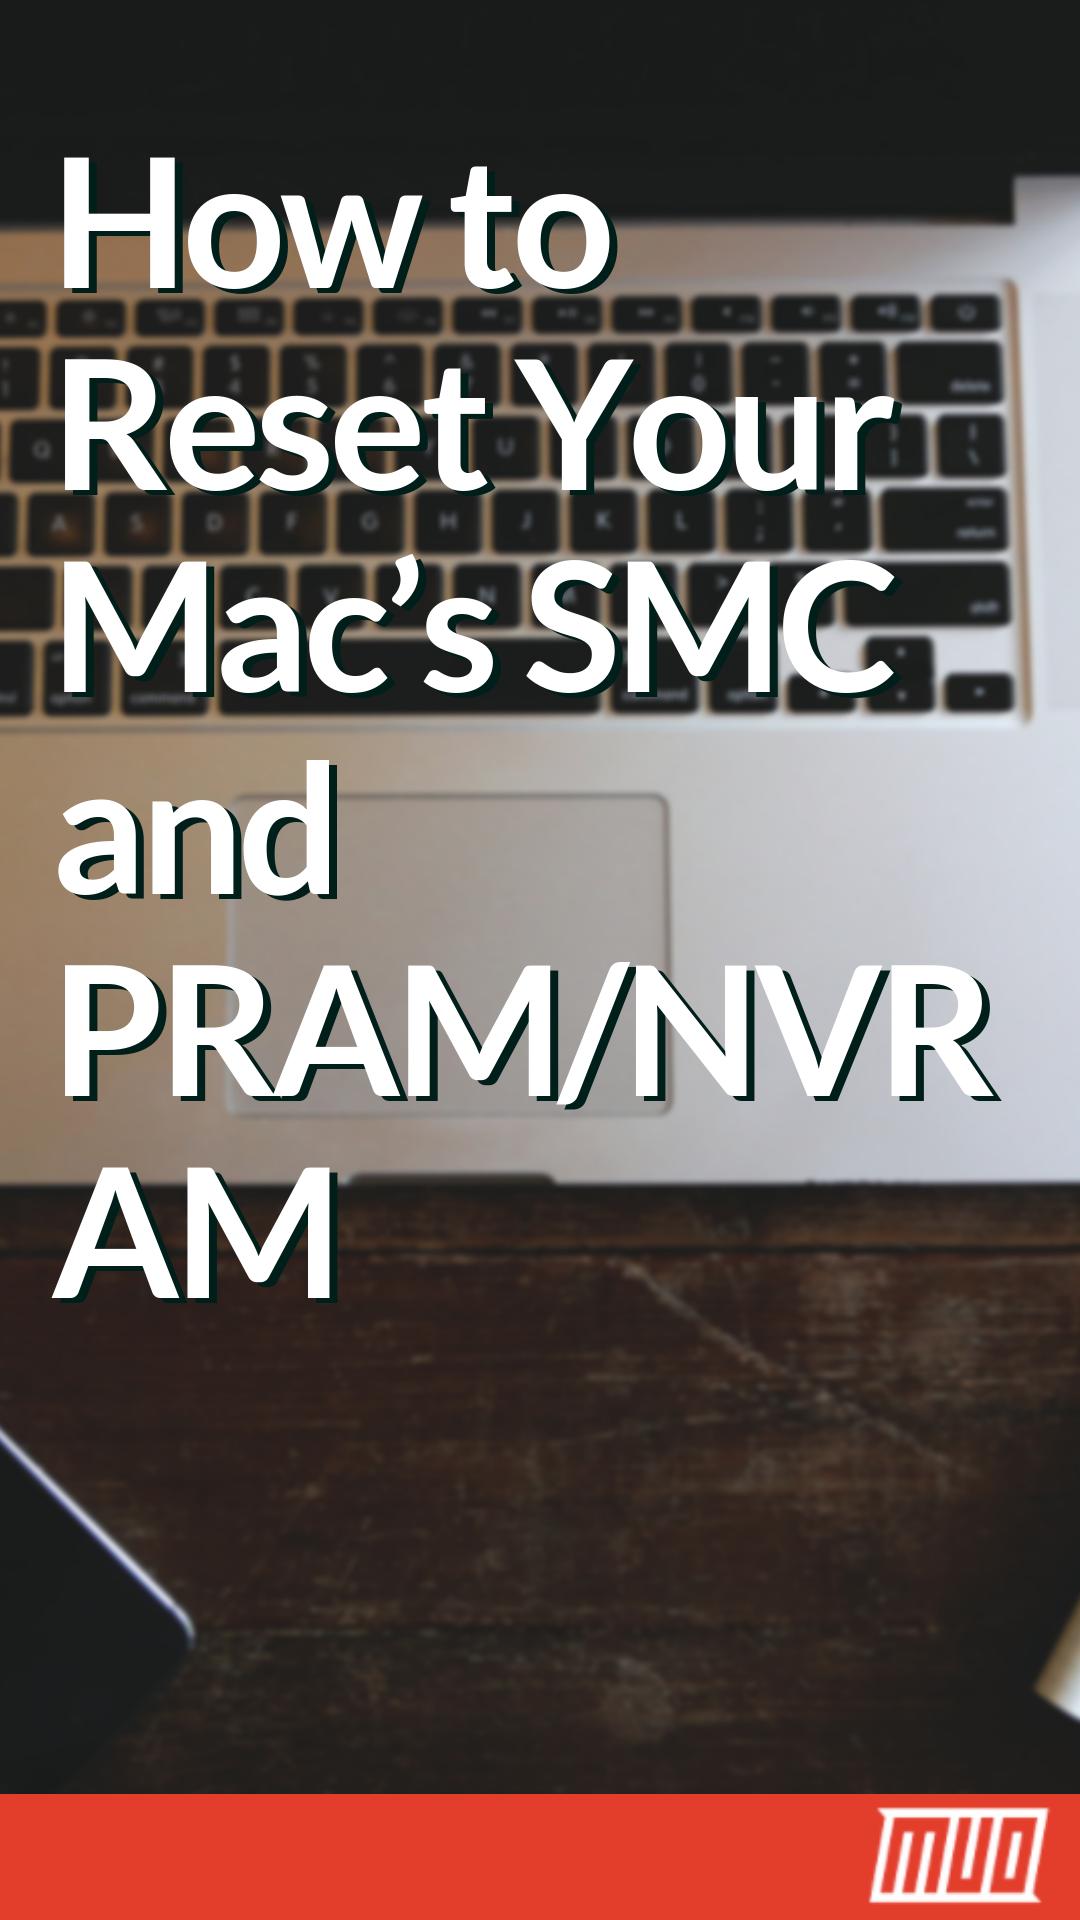 How to Do an SMC and PRAM/NVRAM Reset on Your Mac | Mac OS